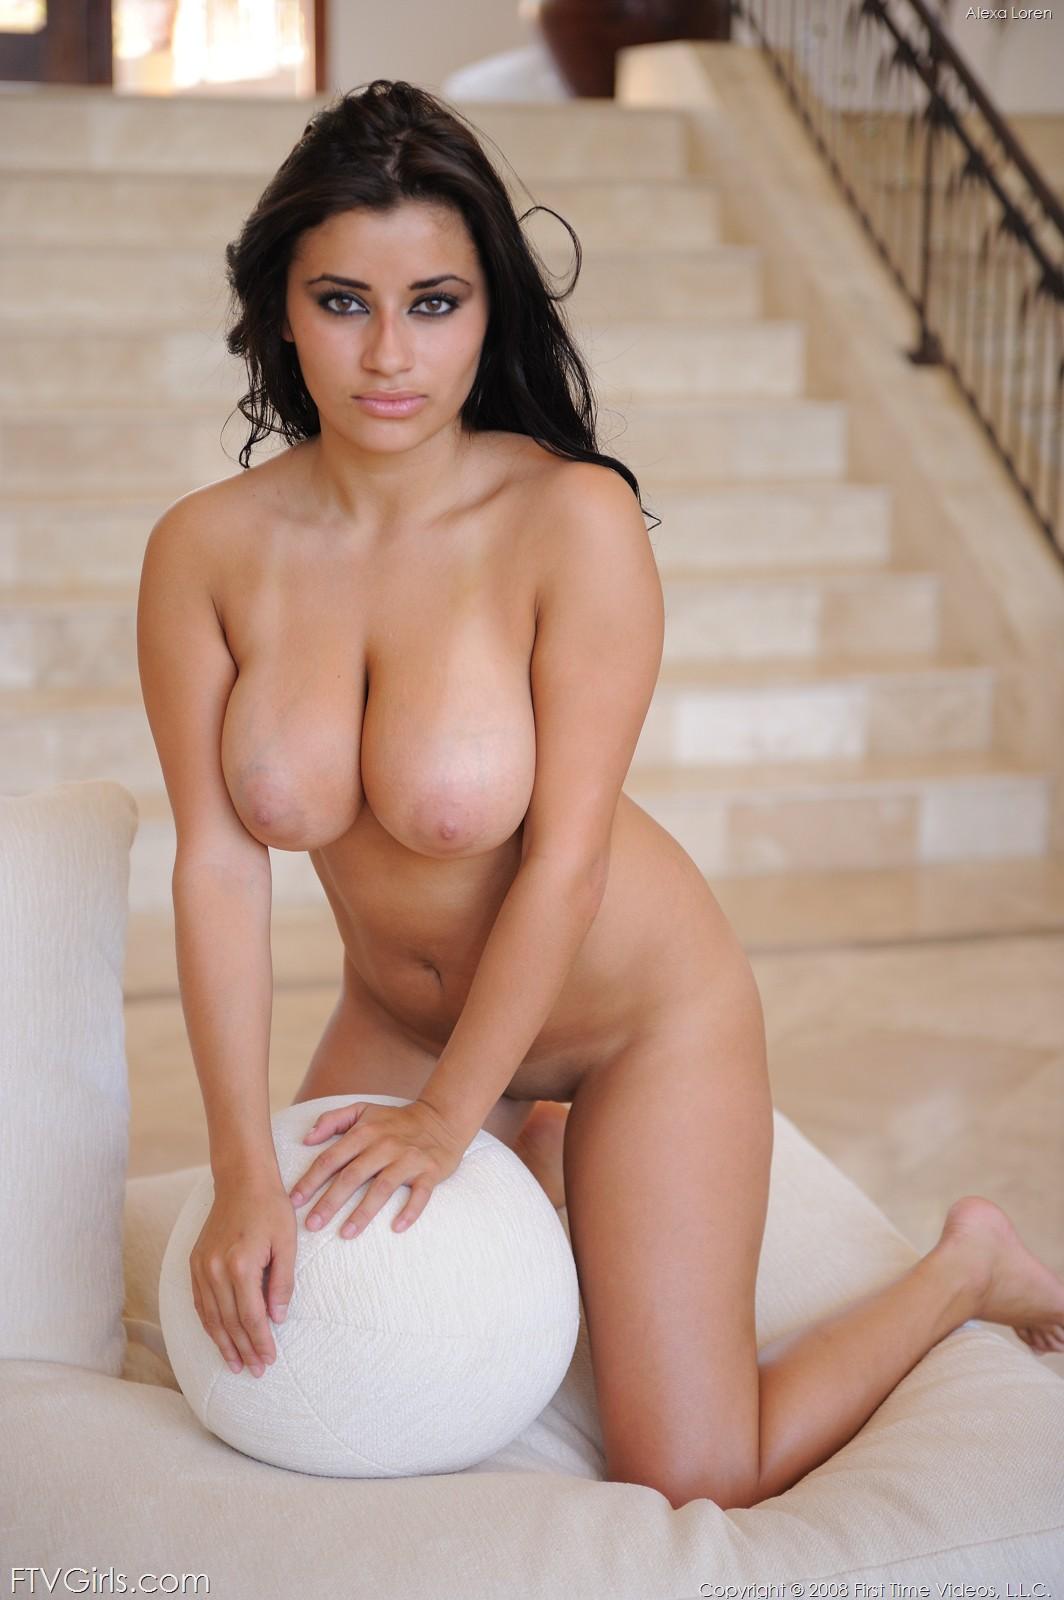 victoria james model nude